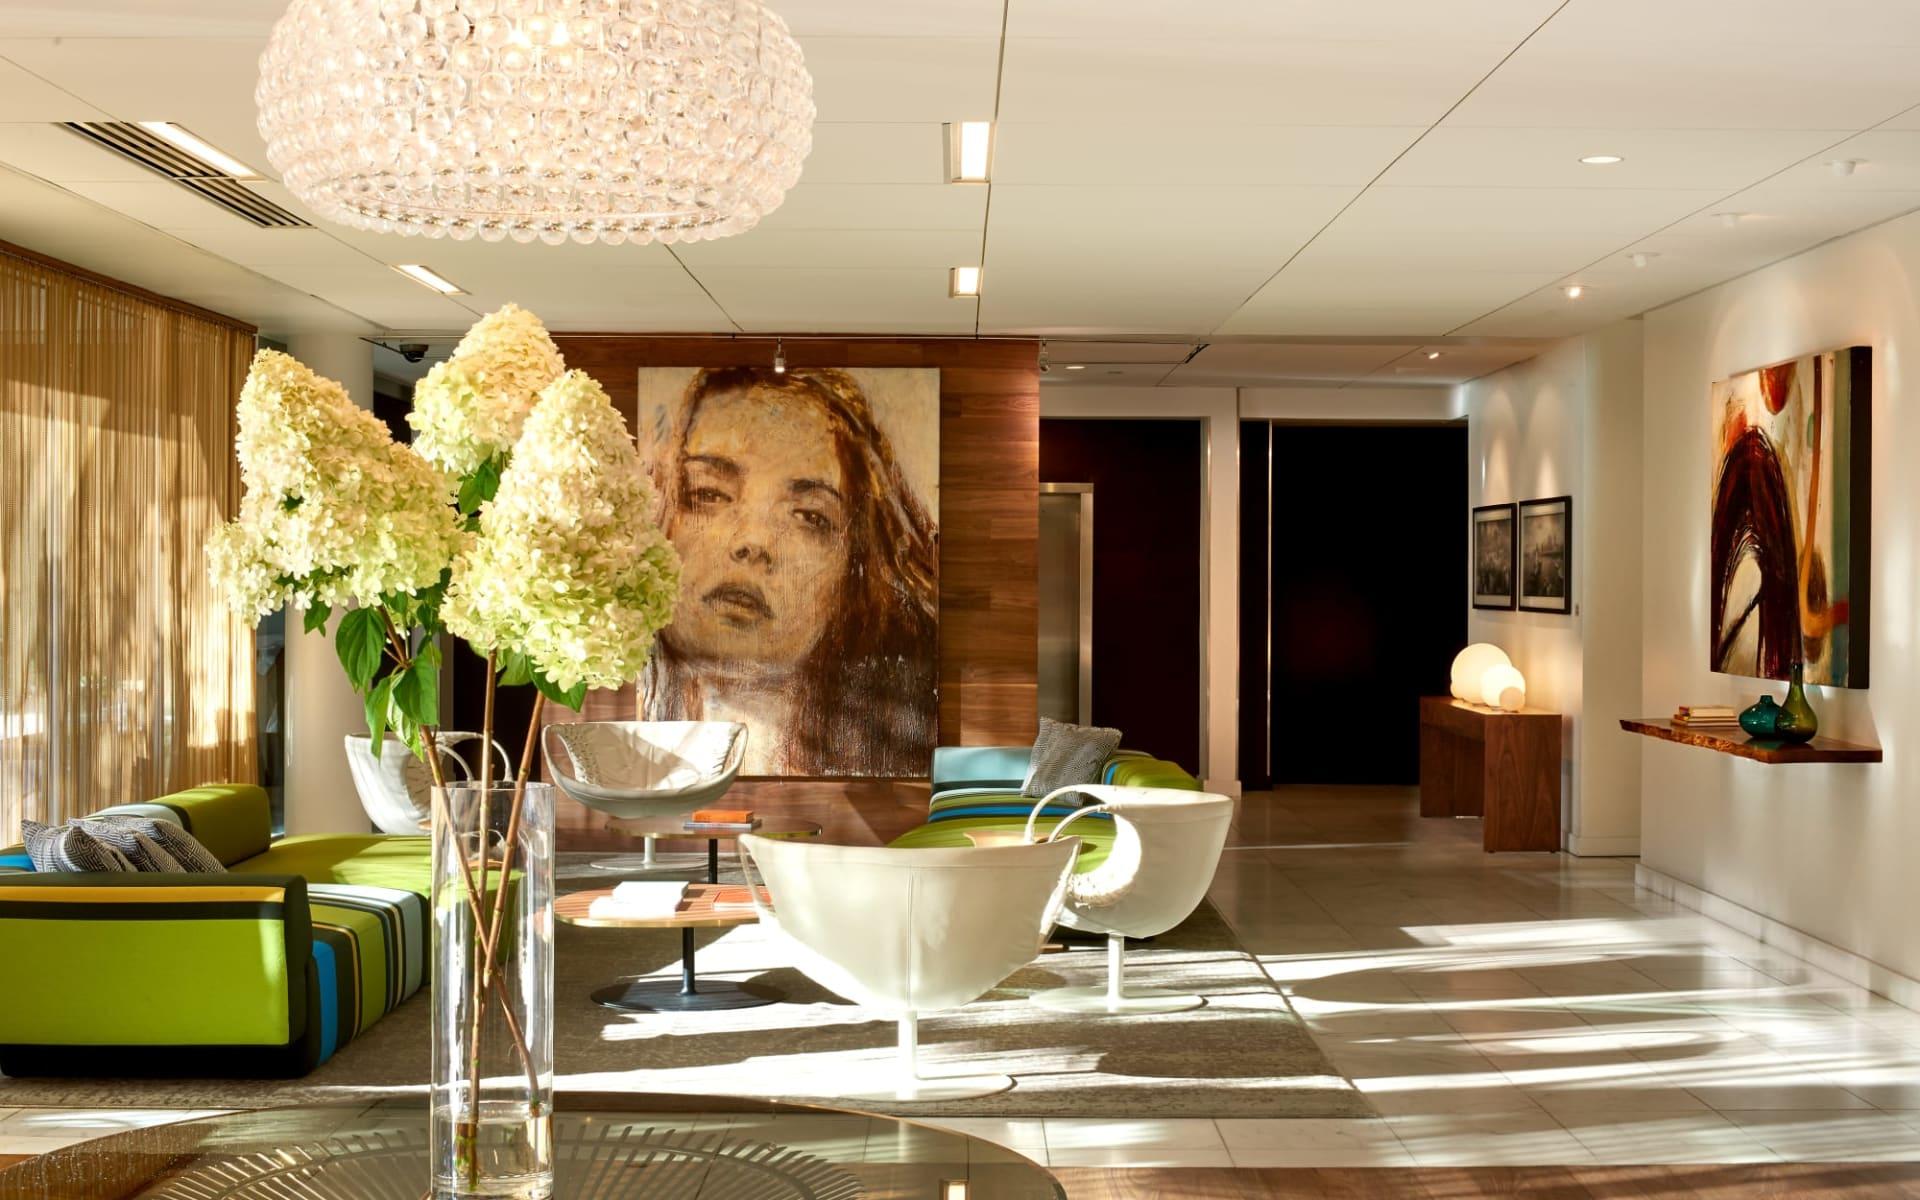 The Hotel Zags in Portland:  Hotel Modera_Lobby 2_ATI